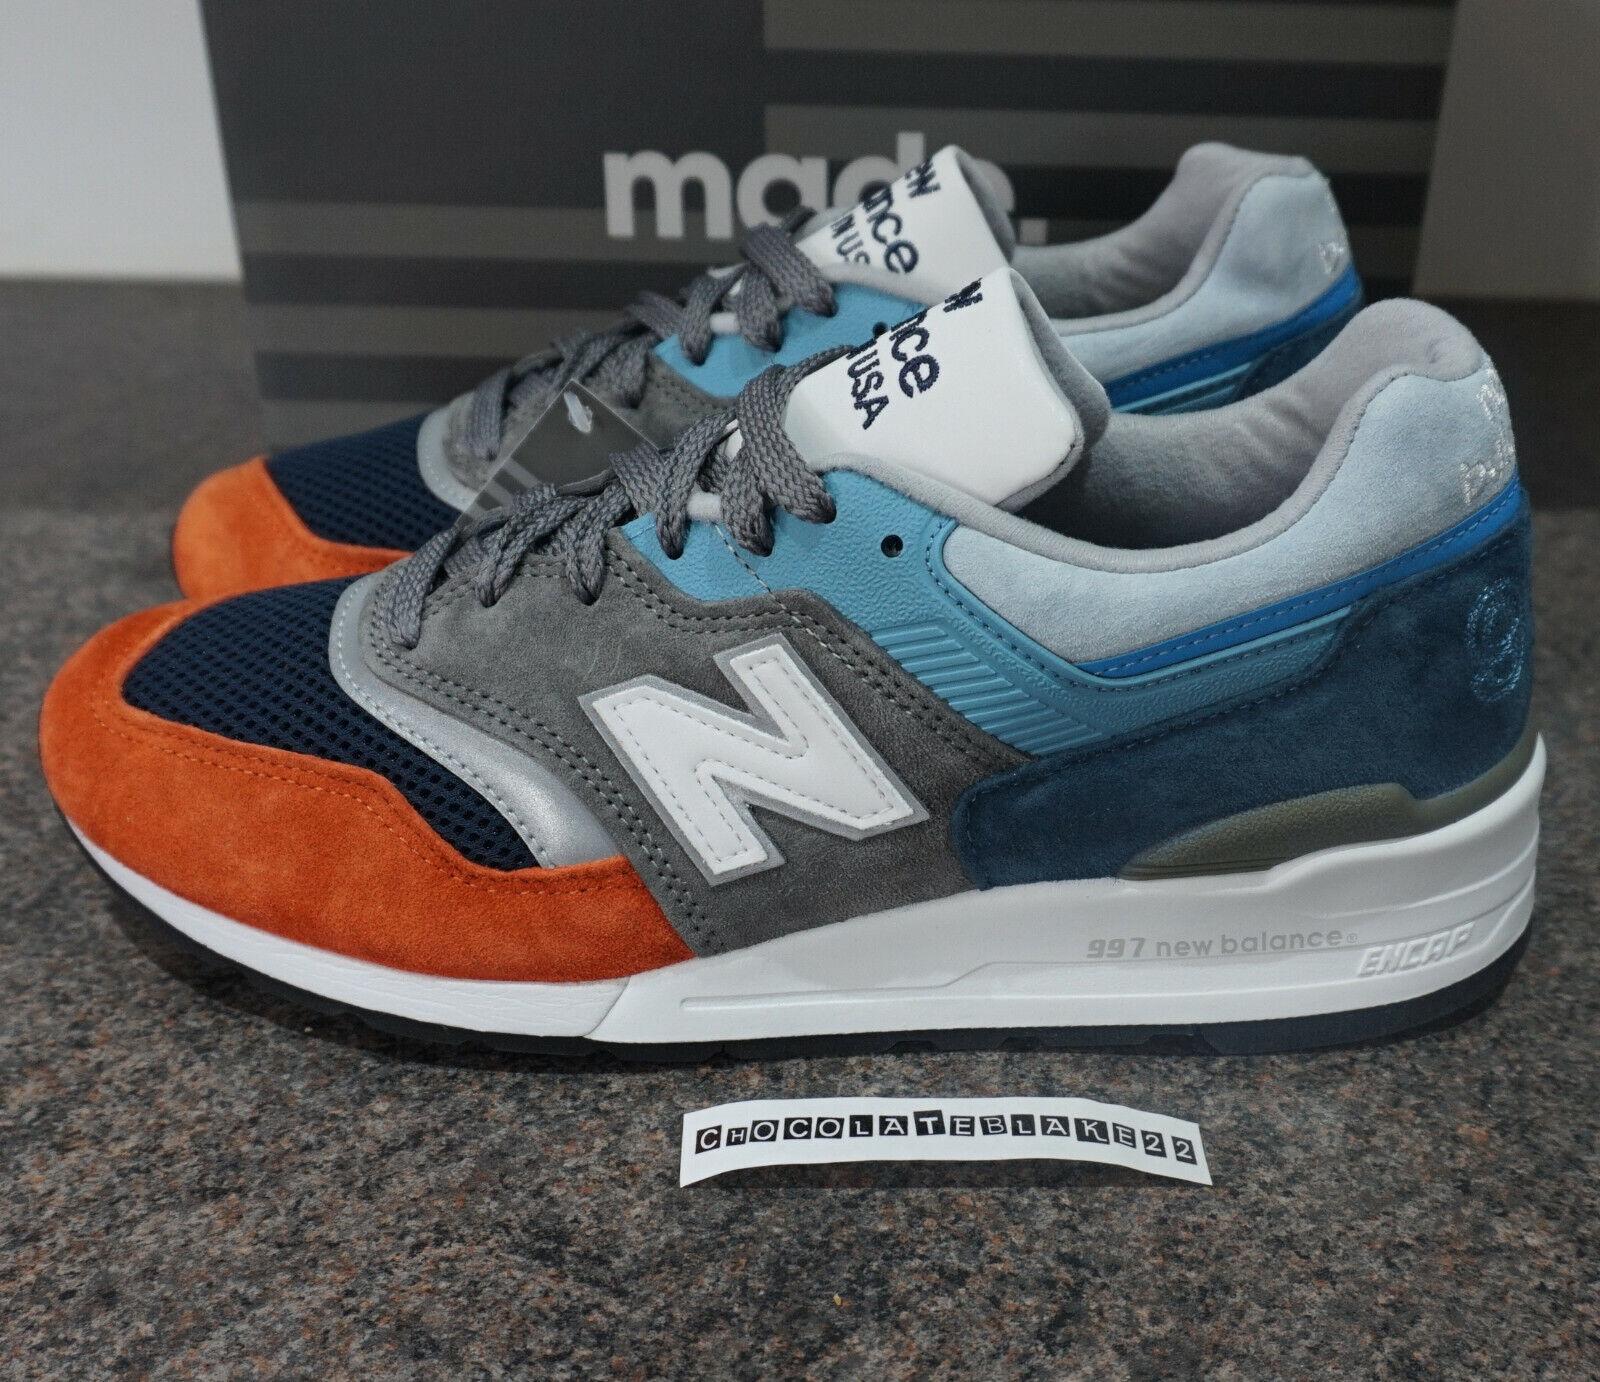 New Balance M997NAG UK 9 990 997 991 998 Made In the USA